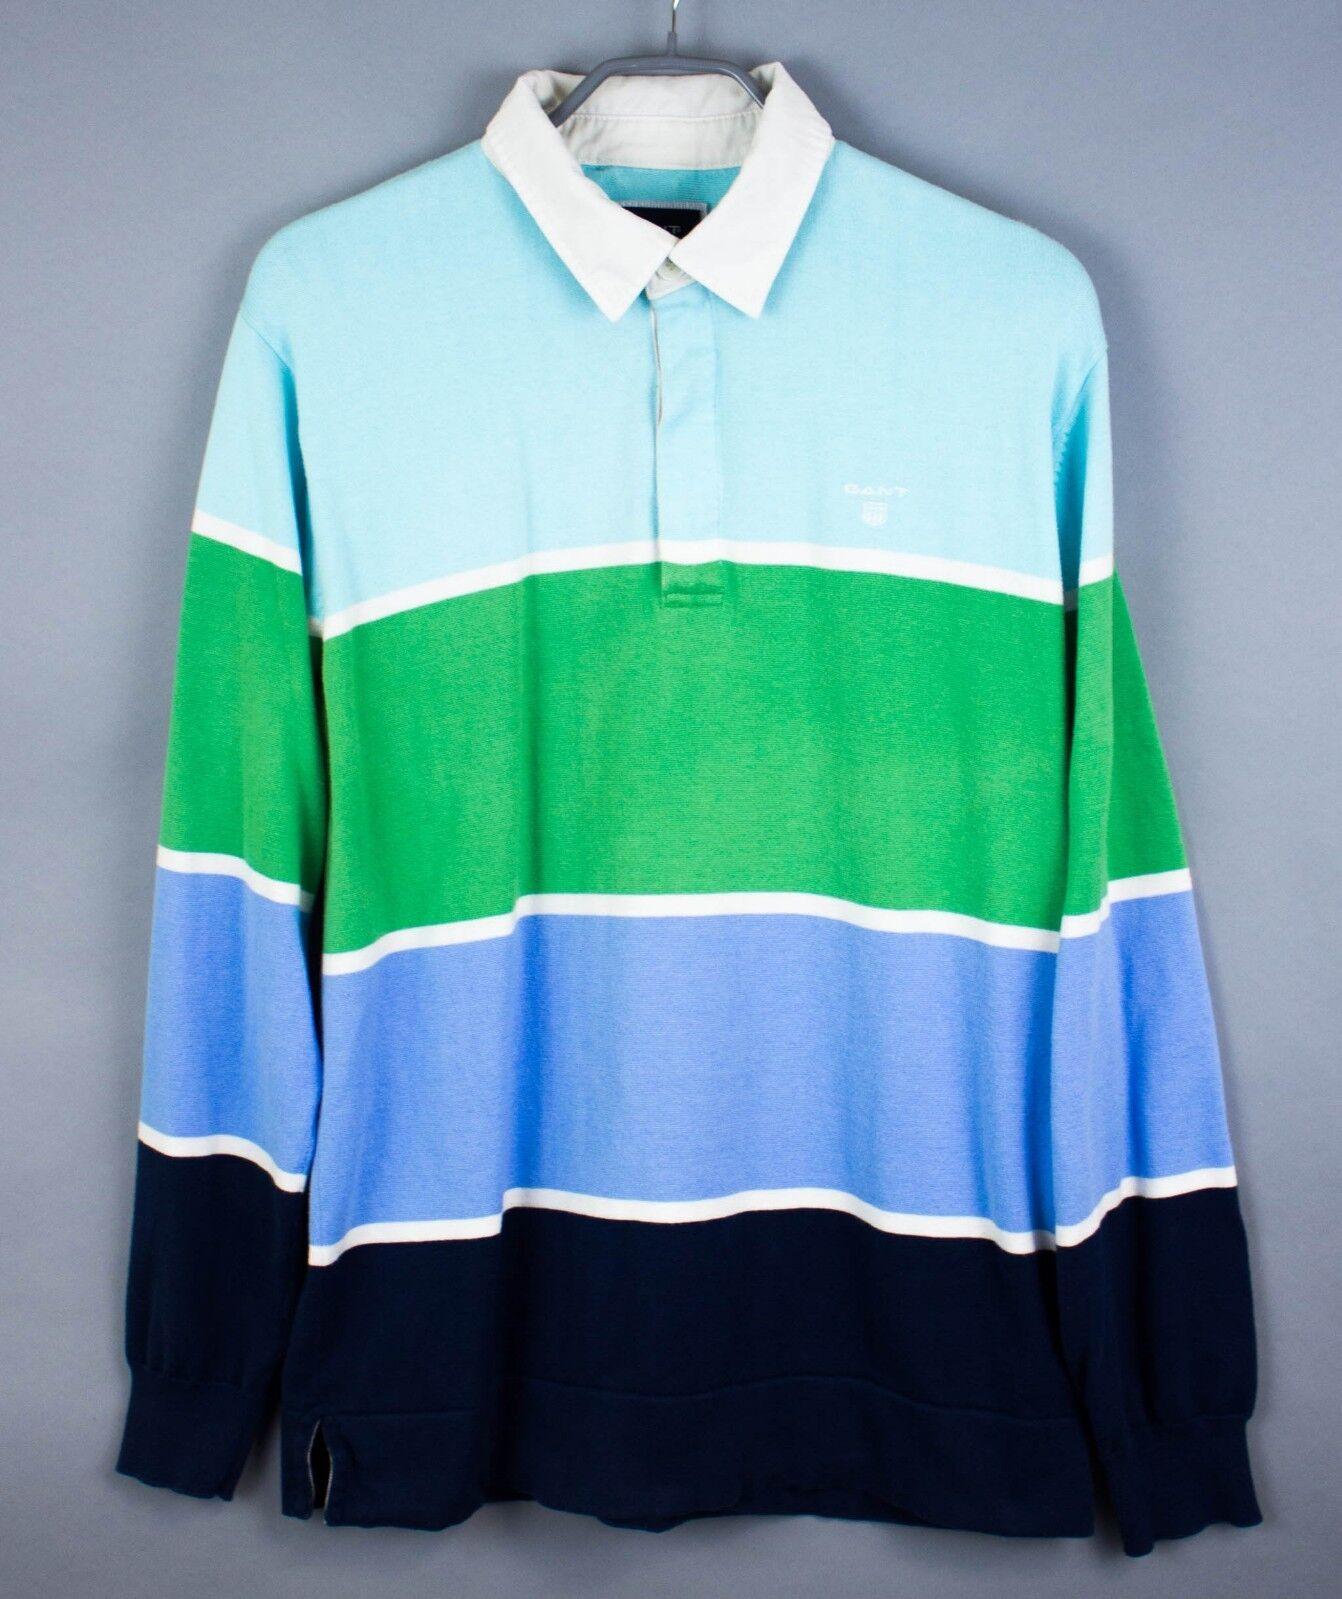 Gant Hombre Jersey Cuello Polo Jersey Top Casual size L Gz252